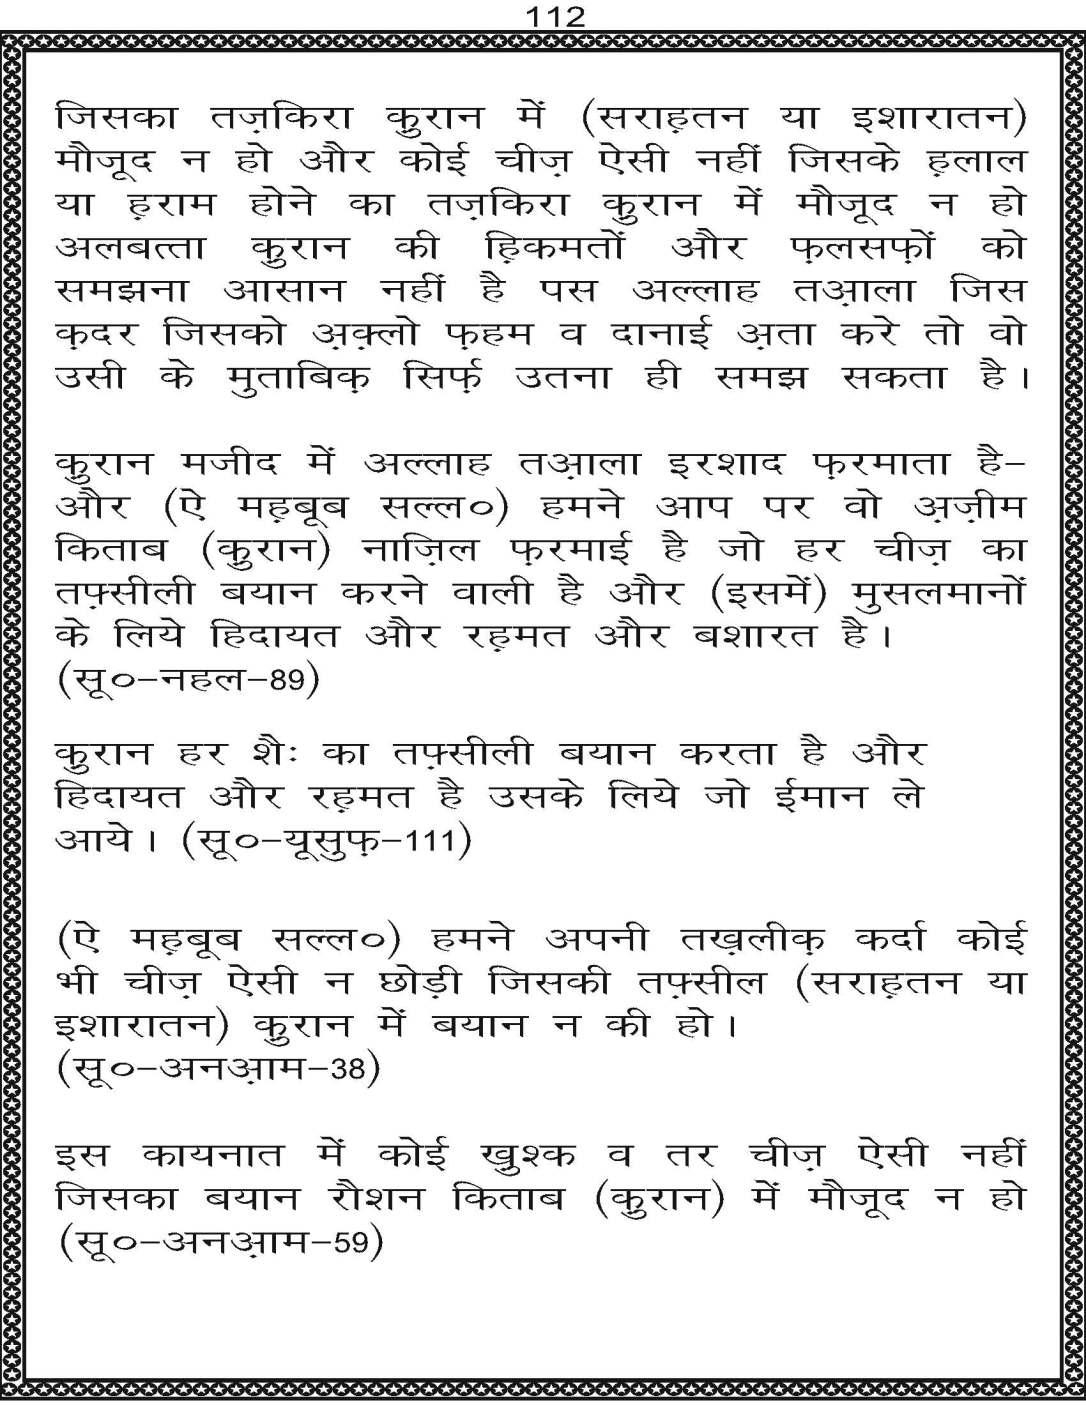 AzmateTaziyadari_Page_112